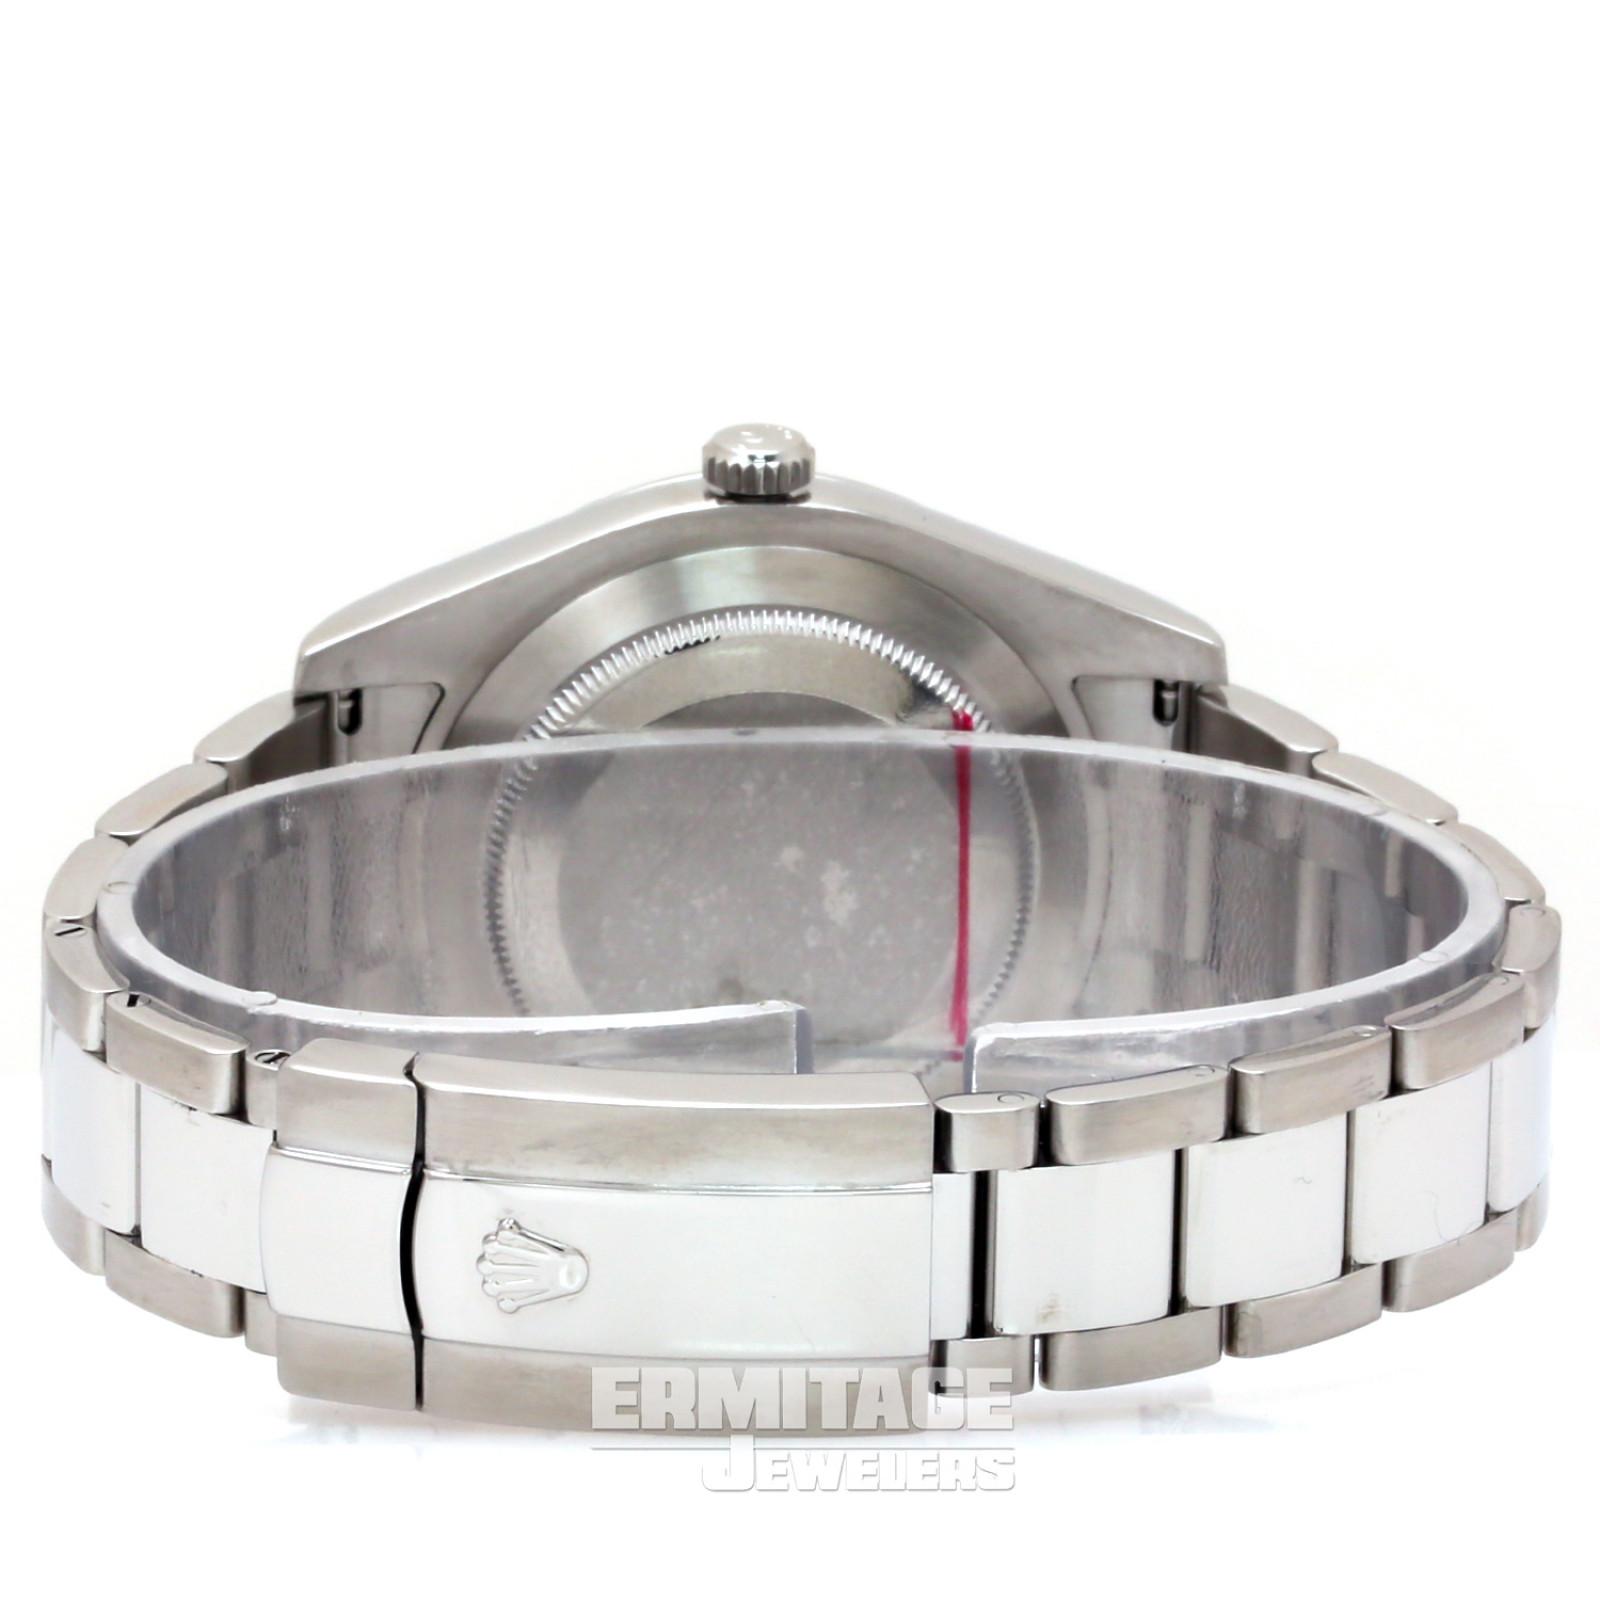 Stainless Steel Rolex Datejust 116300 41 mm